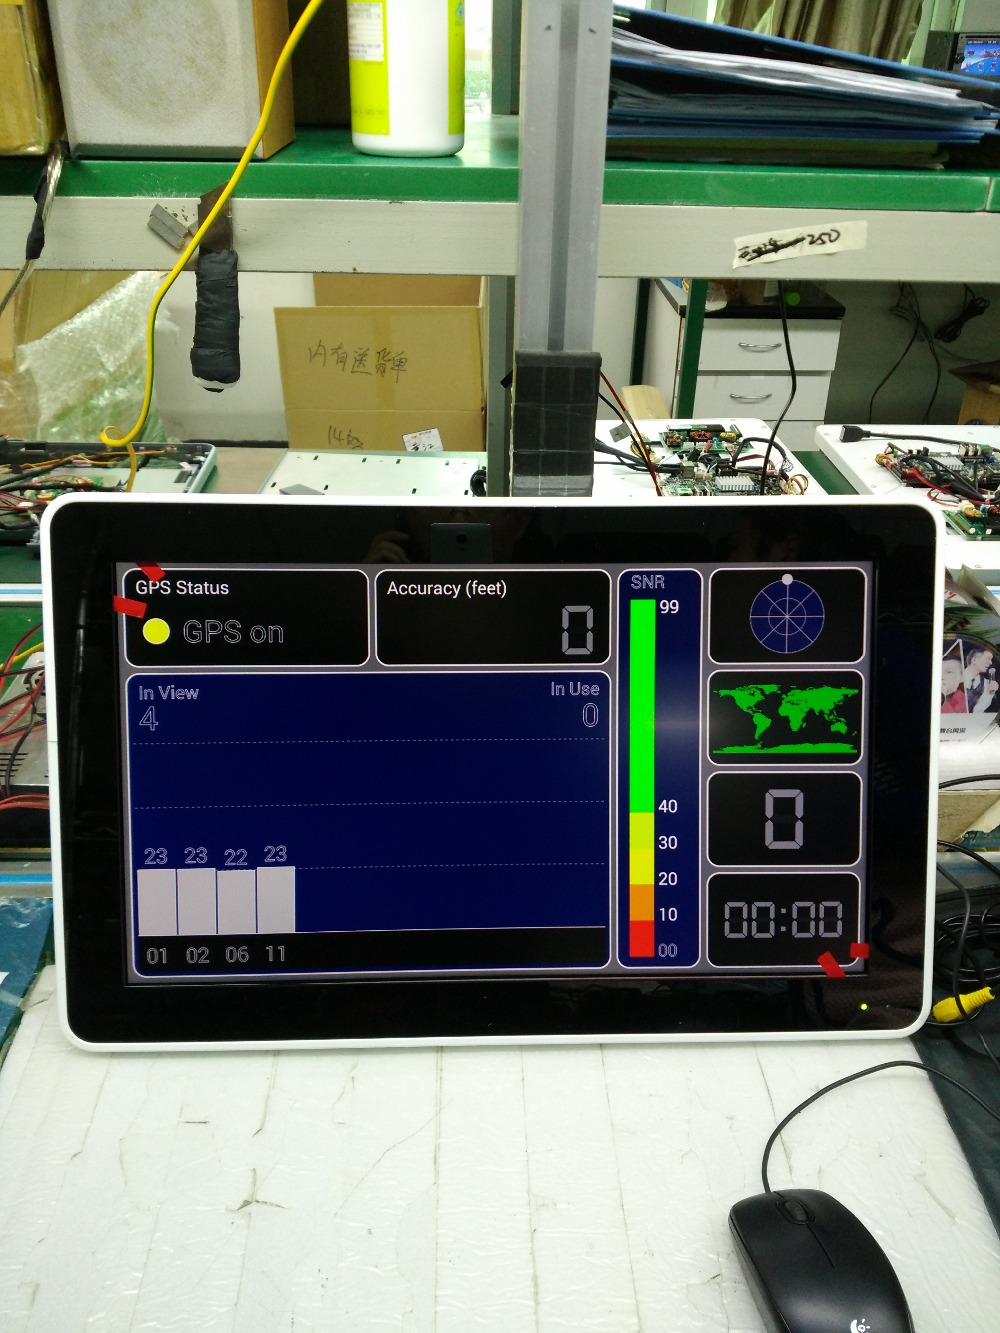 DC12 24V 21.5 ''металлический каркас на крыше автобуса монитор 2 AV вход потолок дисплей с Android4.4 OS. 3G 4 г GPS VGA, HDMI, USB SD